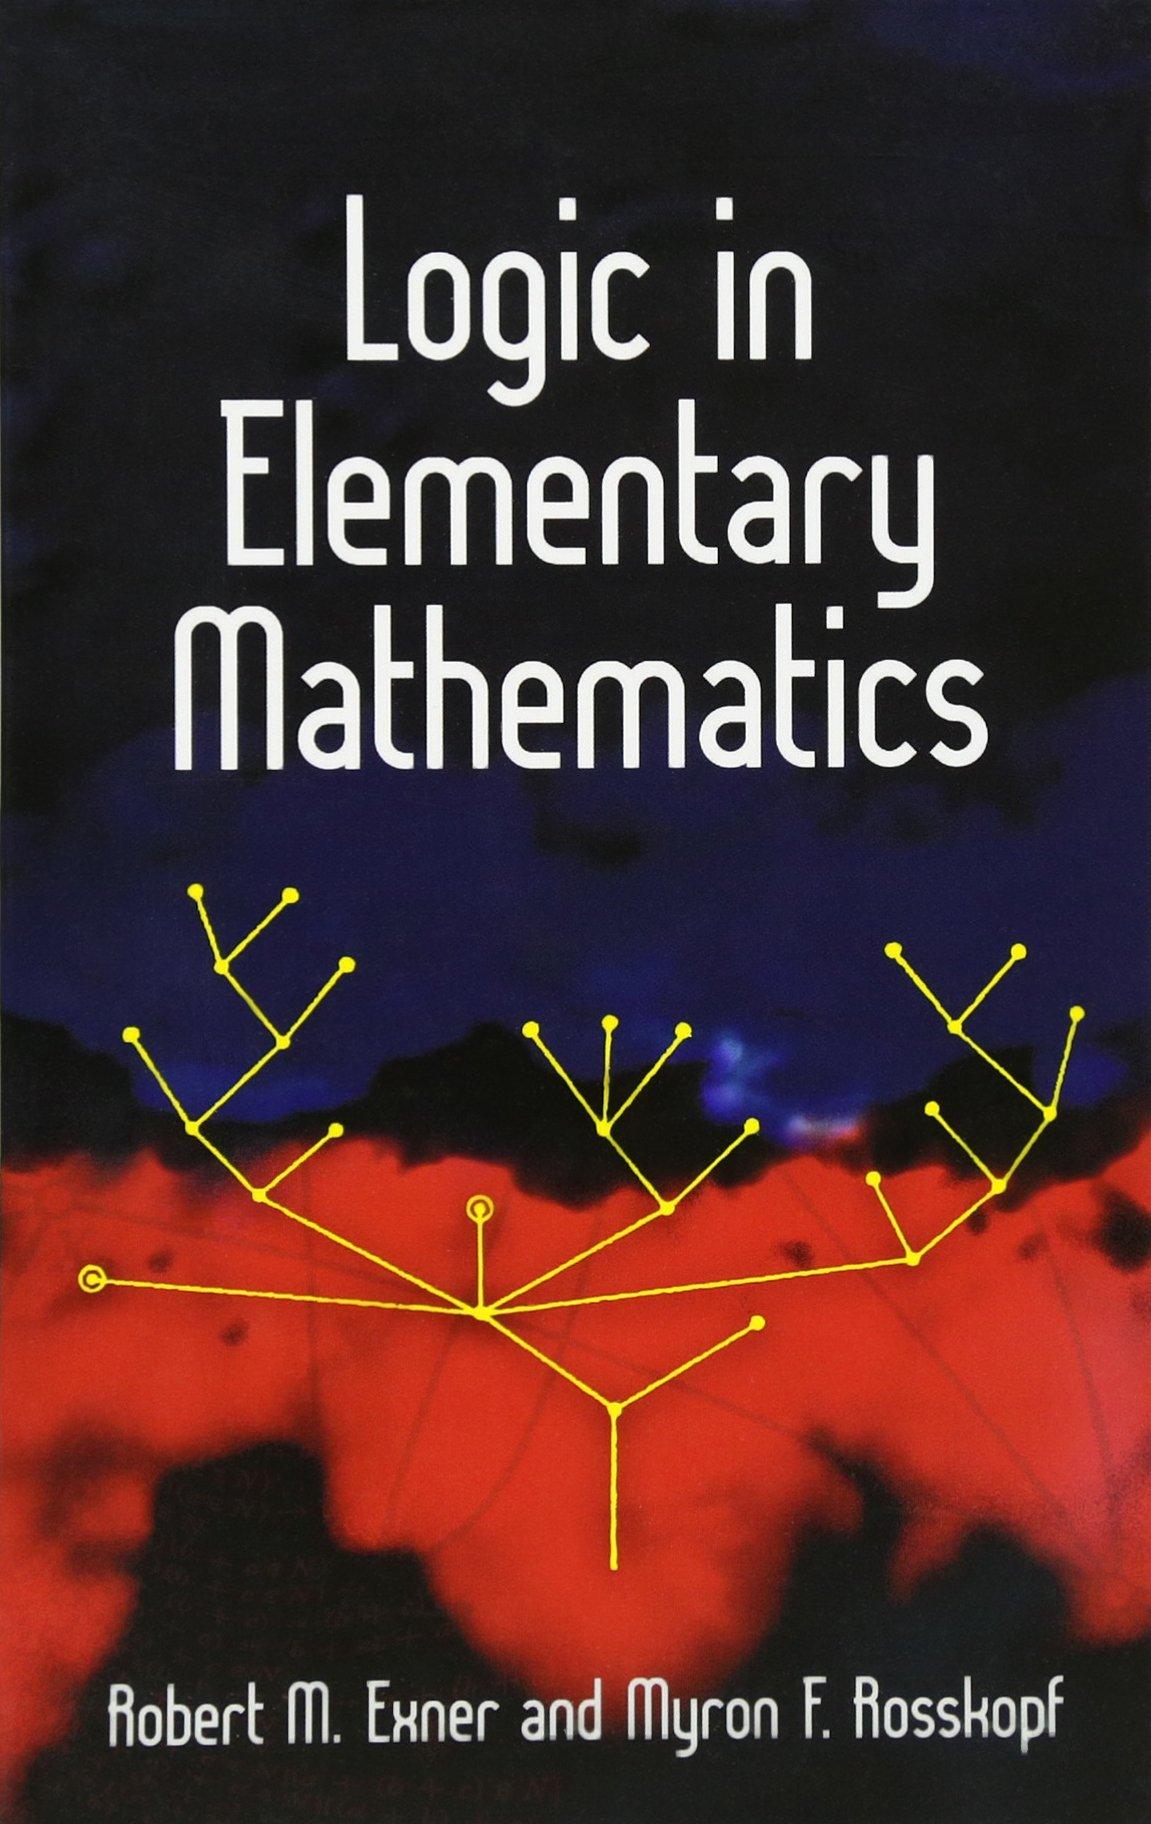 Download Logic in Elementary Mathematics (Dover Books on Mathematics) ebook